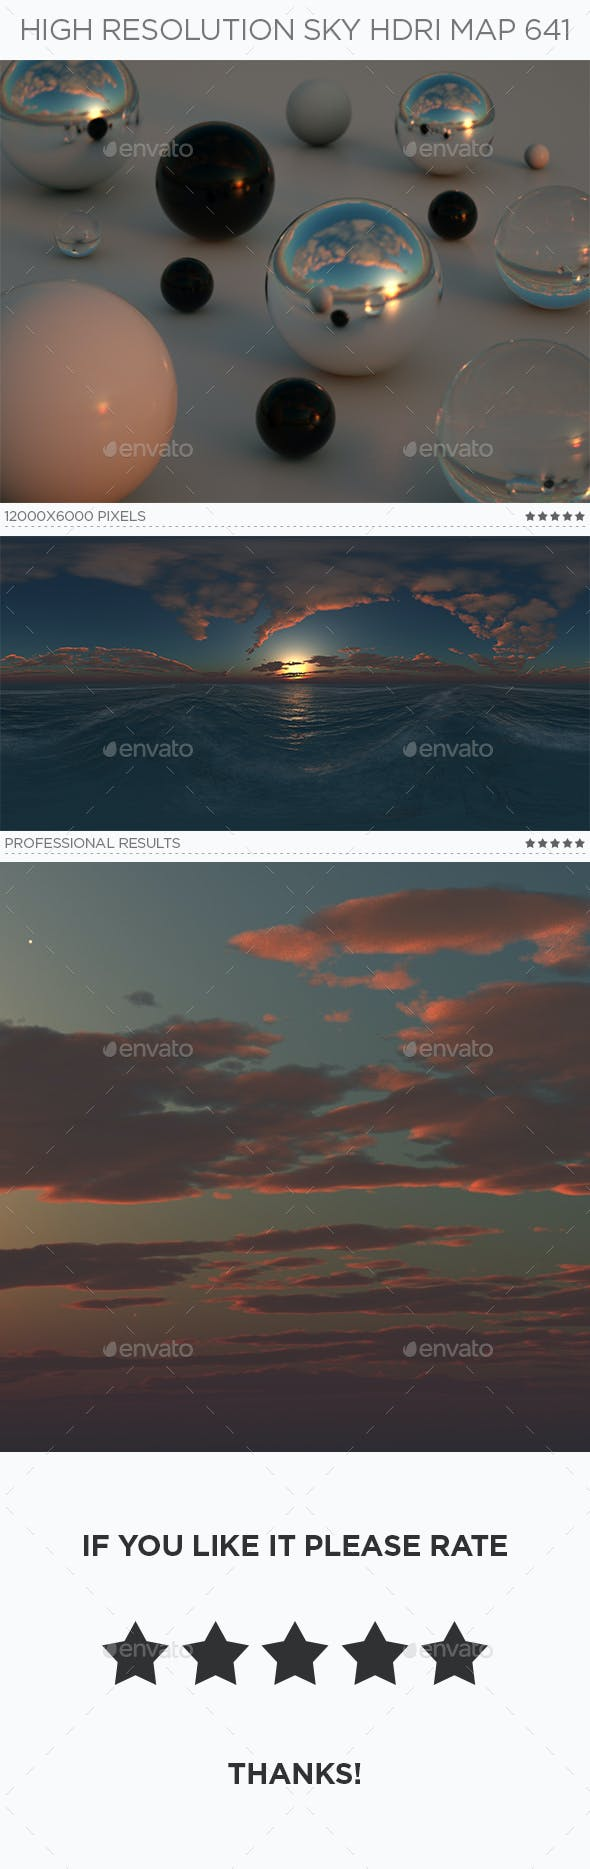 High Resolution Sky HDRi Map 641 - 3DOcean Item for Sale